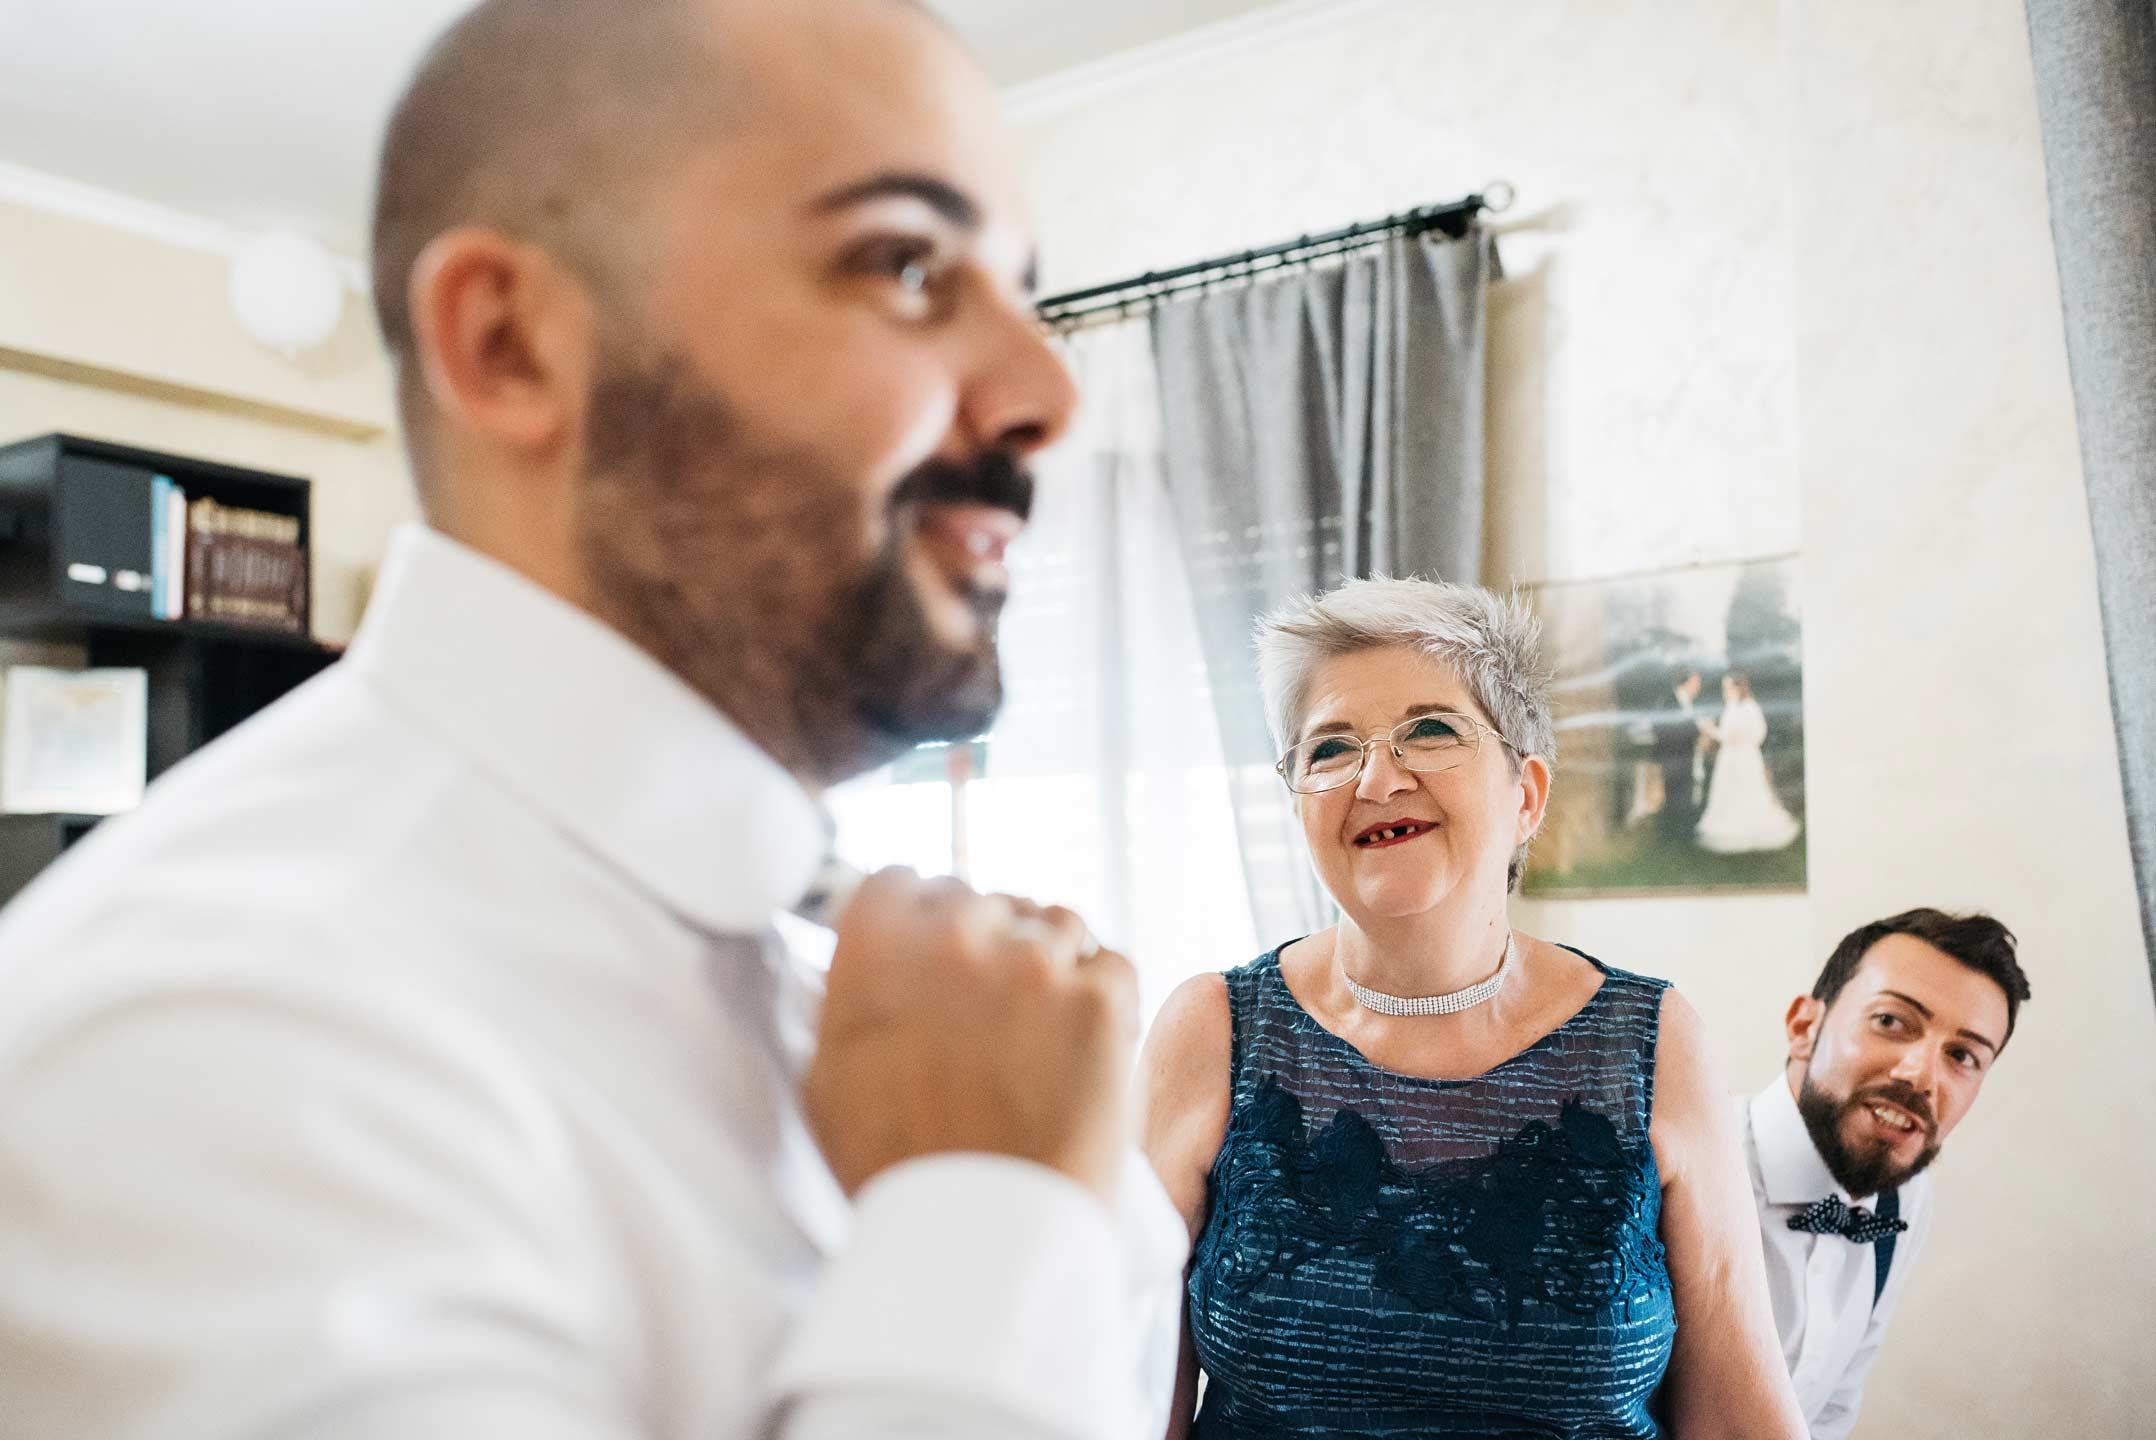 Wedding-Photographer-in-Italy-Destination-Wedding-Italy-Groom